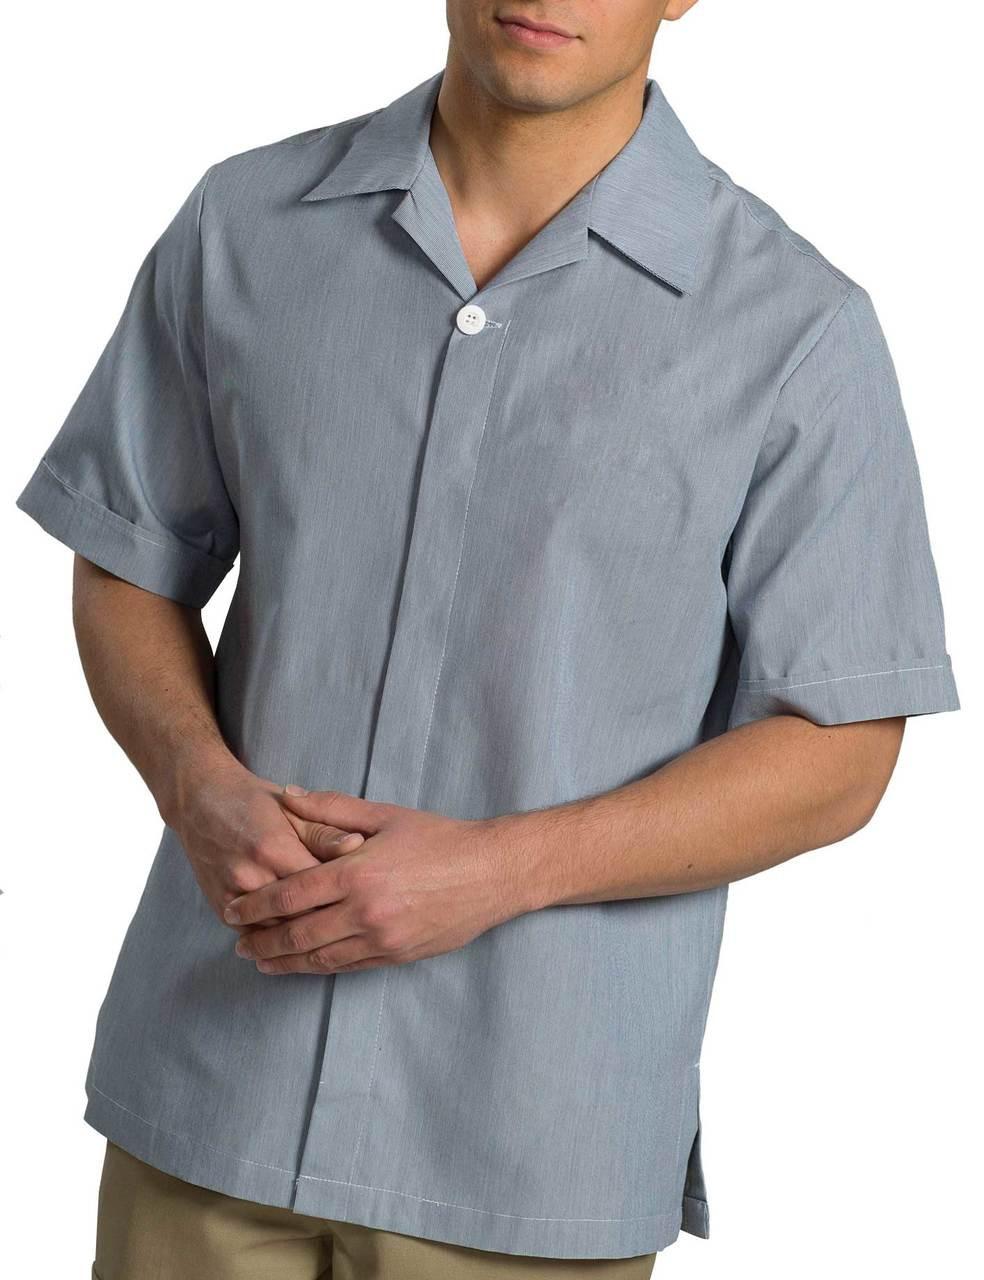 Edwards Garment Men's Pincord Housekeeping Tunic CLOSEOUT No Returns